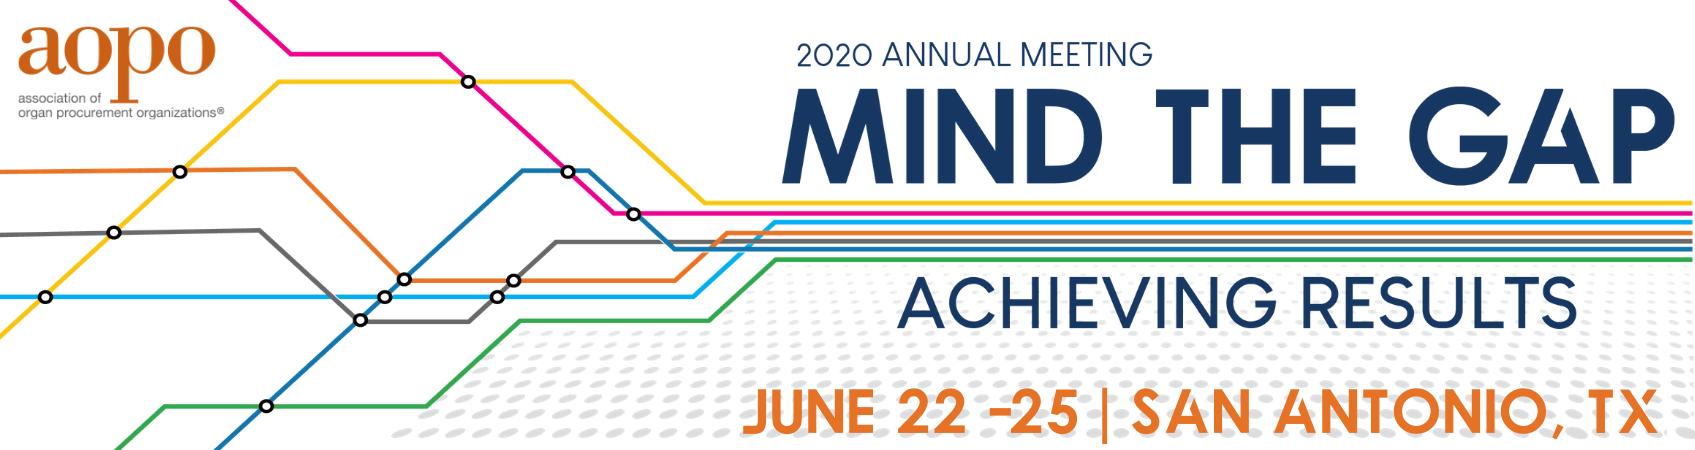 2020 Website Banners